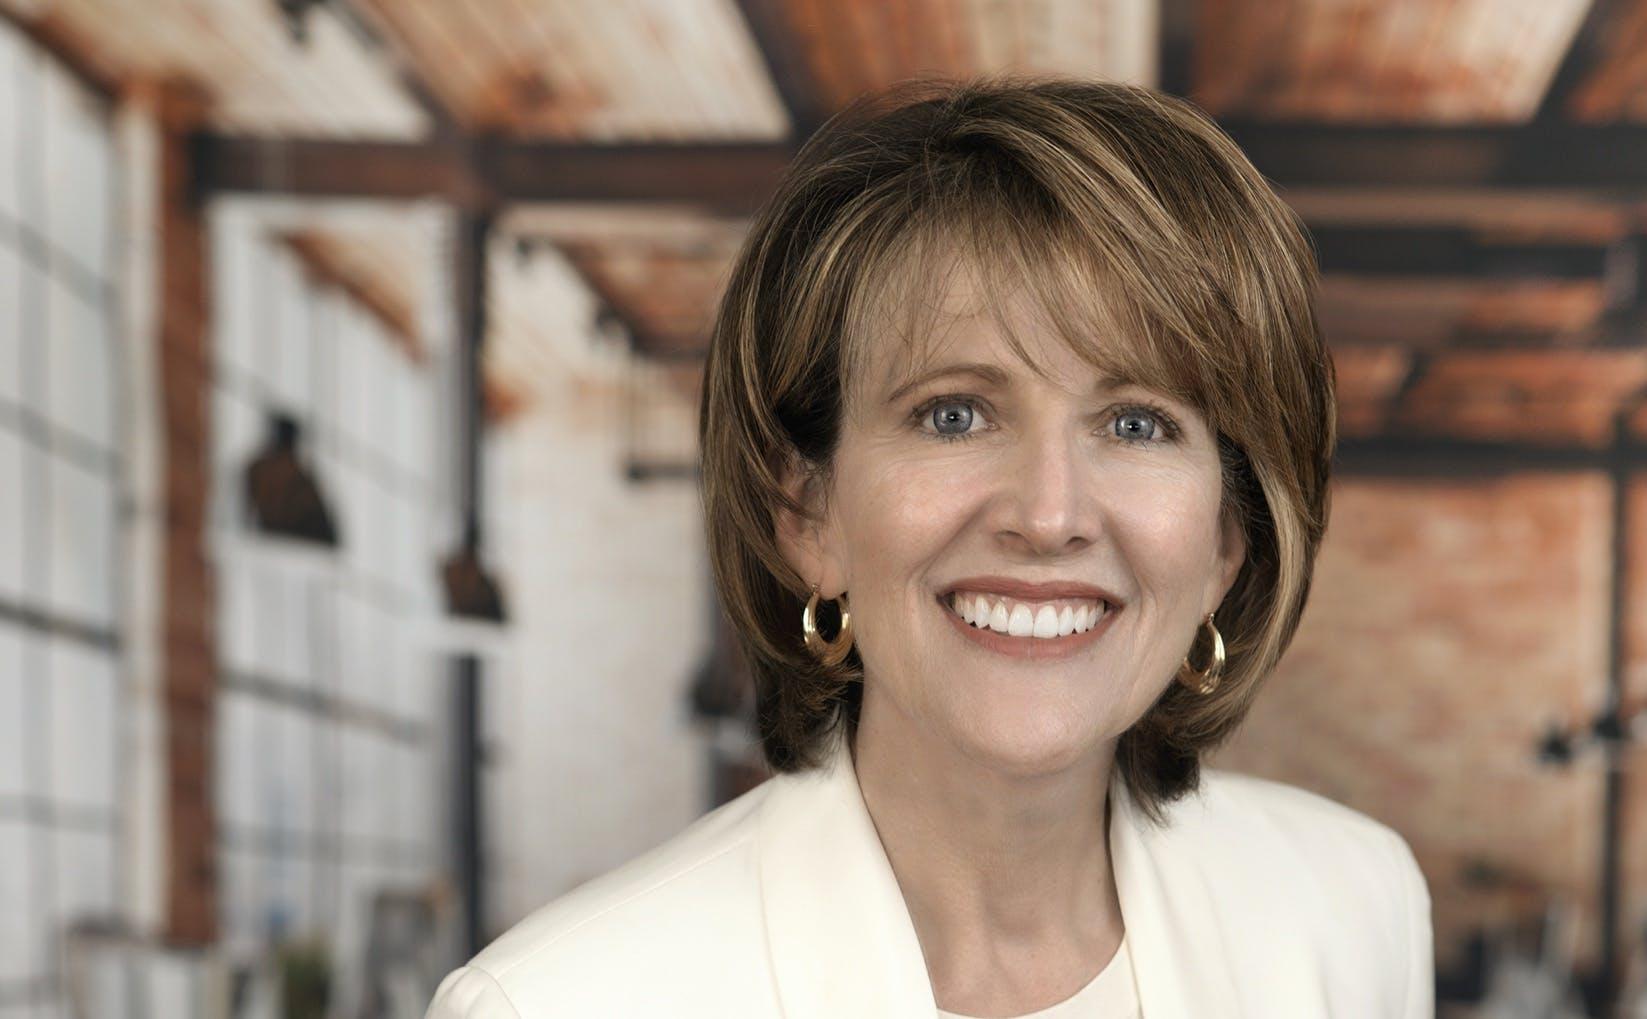 Barbara Kelley, executive director of the Hearing Loss Association of America